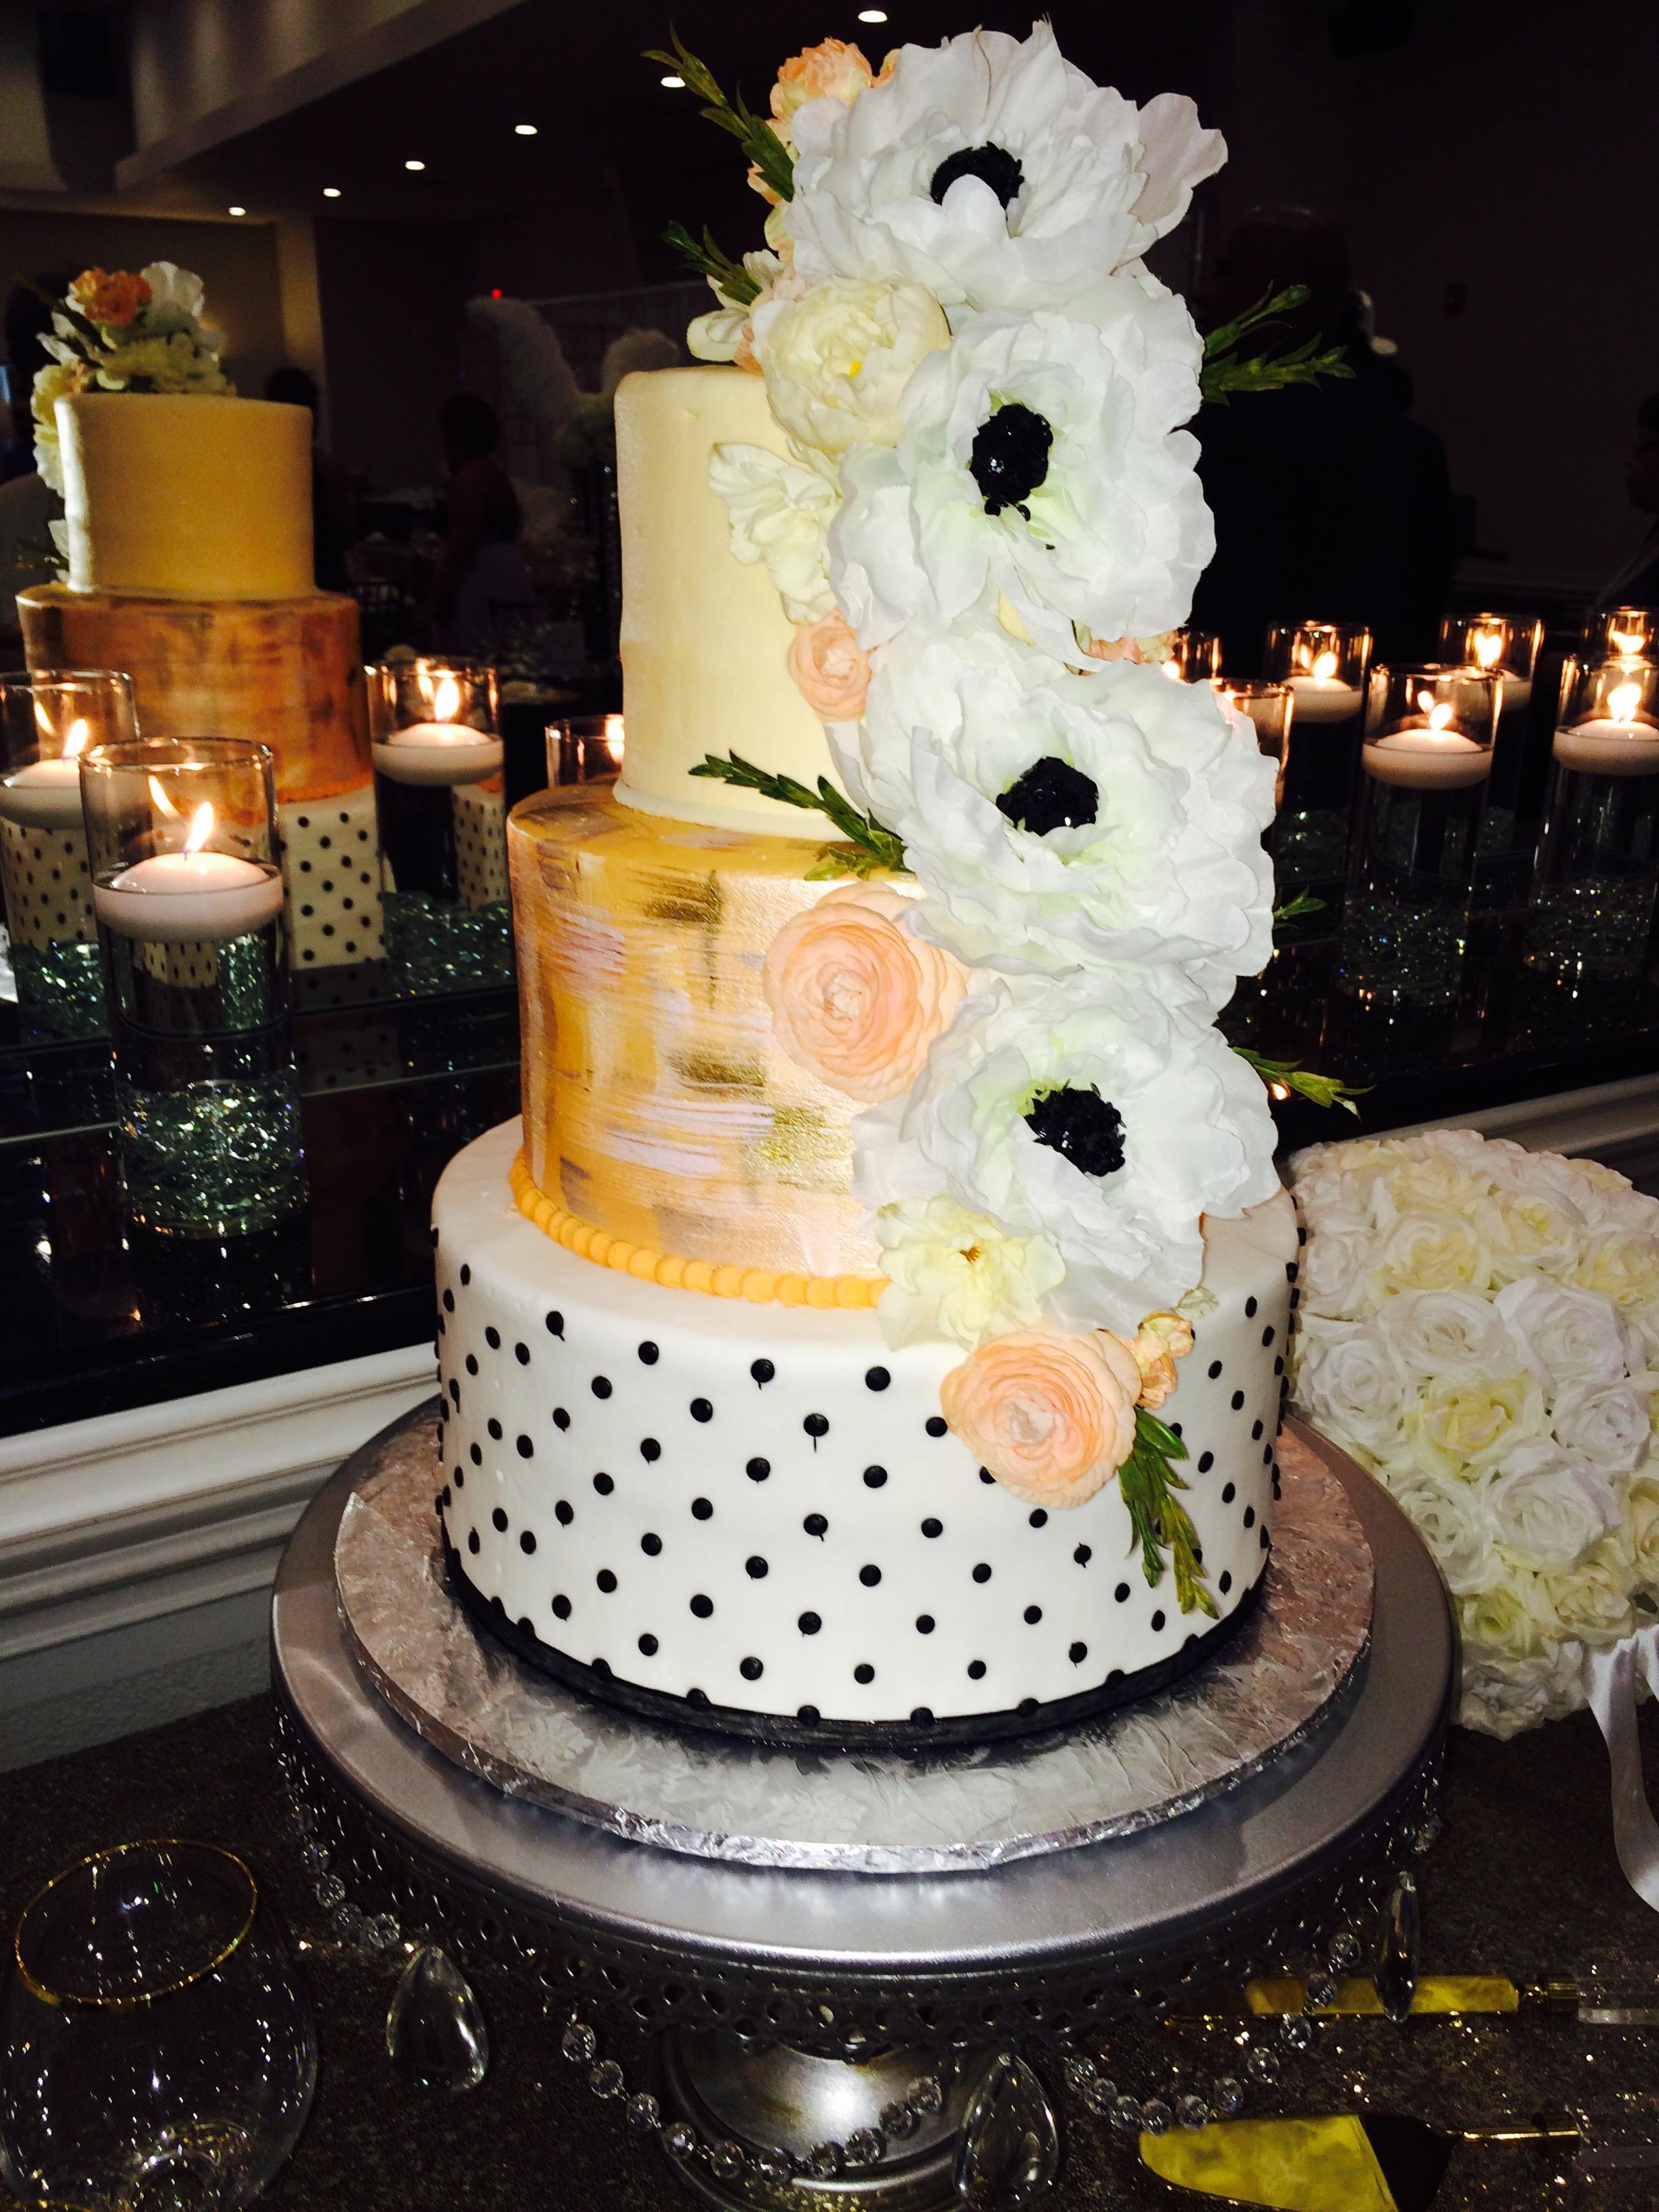 Wedding Cakes by Tammy Allen image 6